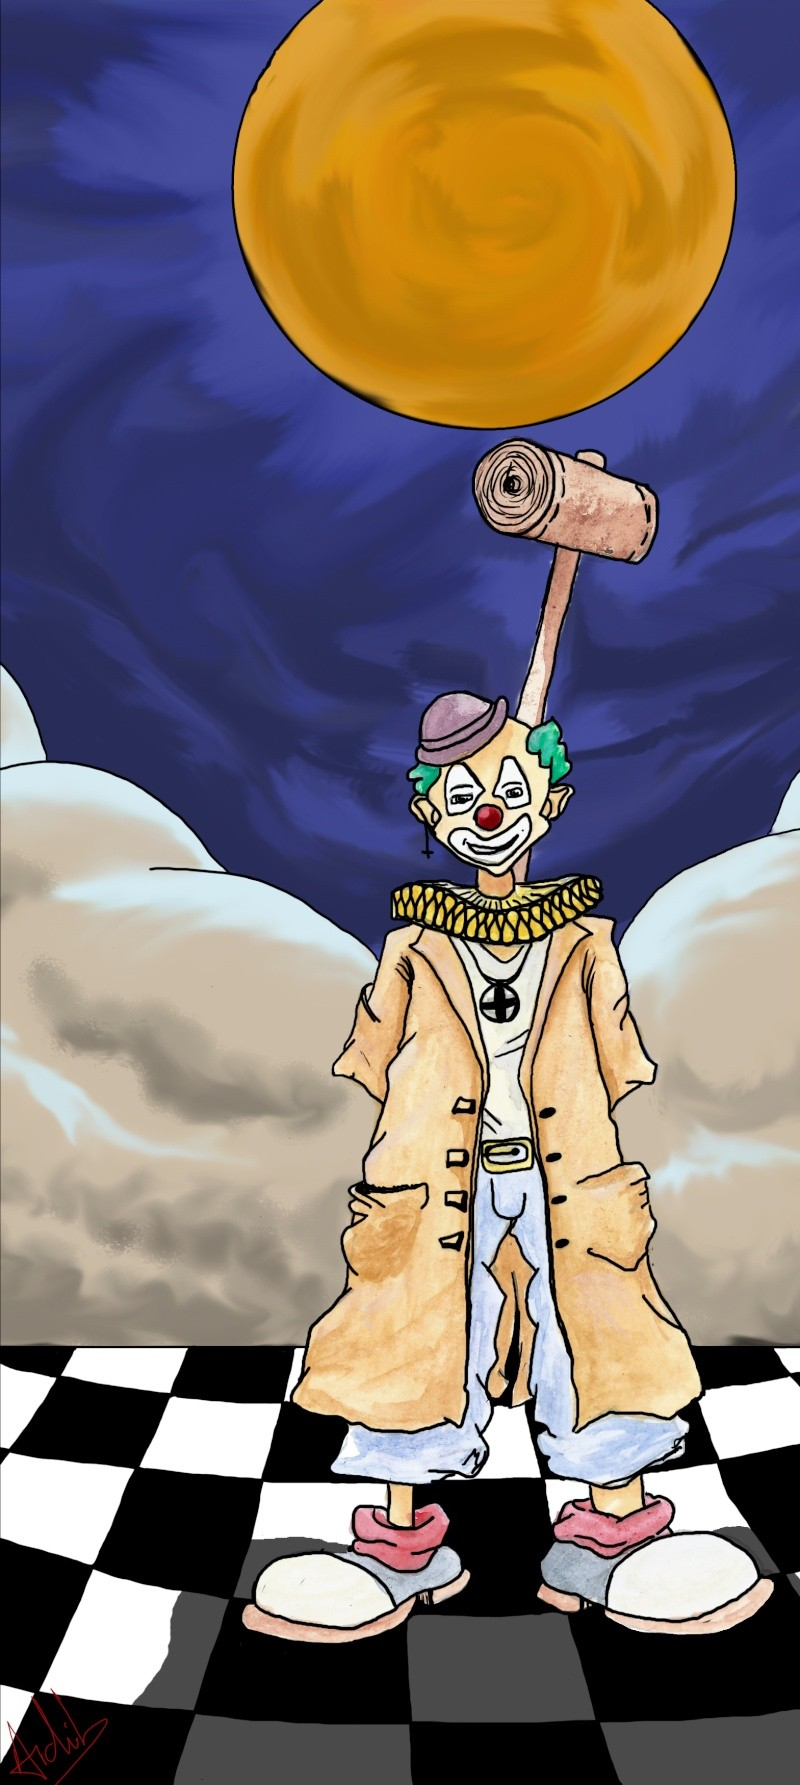 Le SUPERZigouigoui de la semaine - Page 6 Clown_10